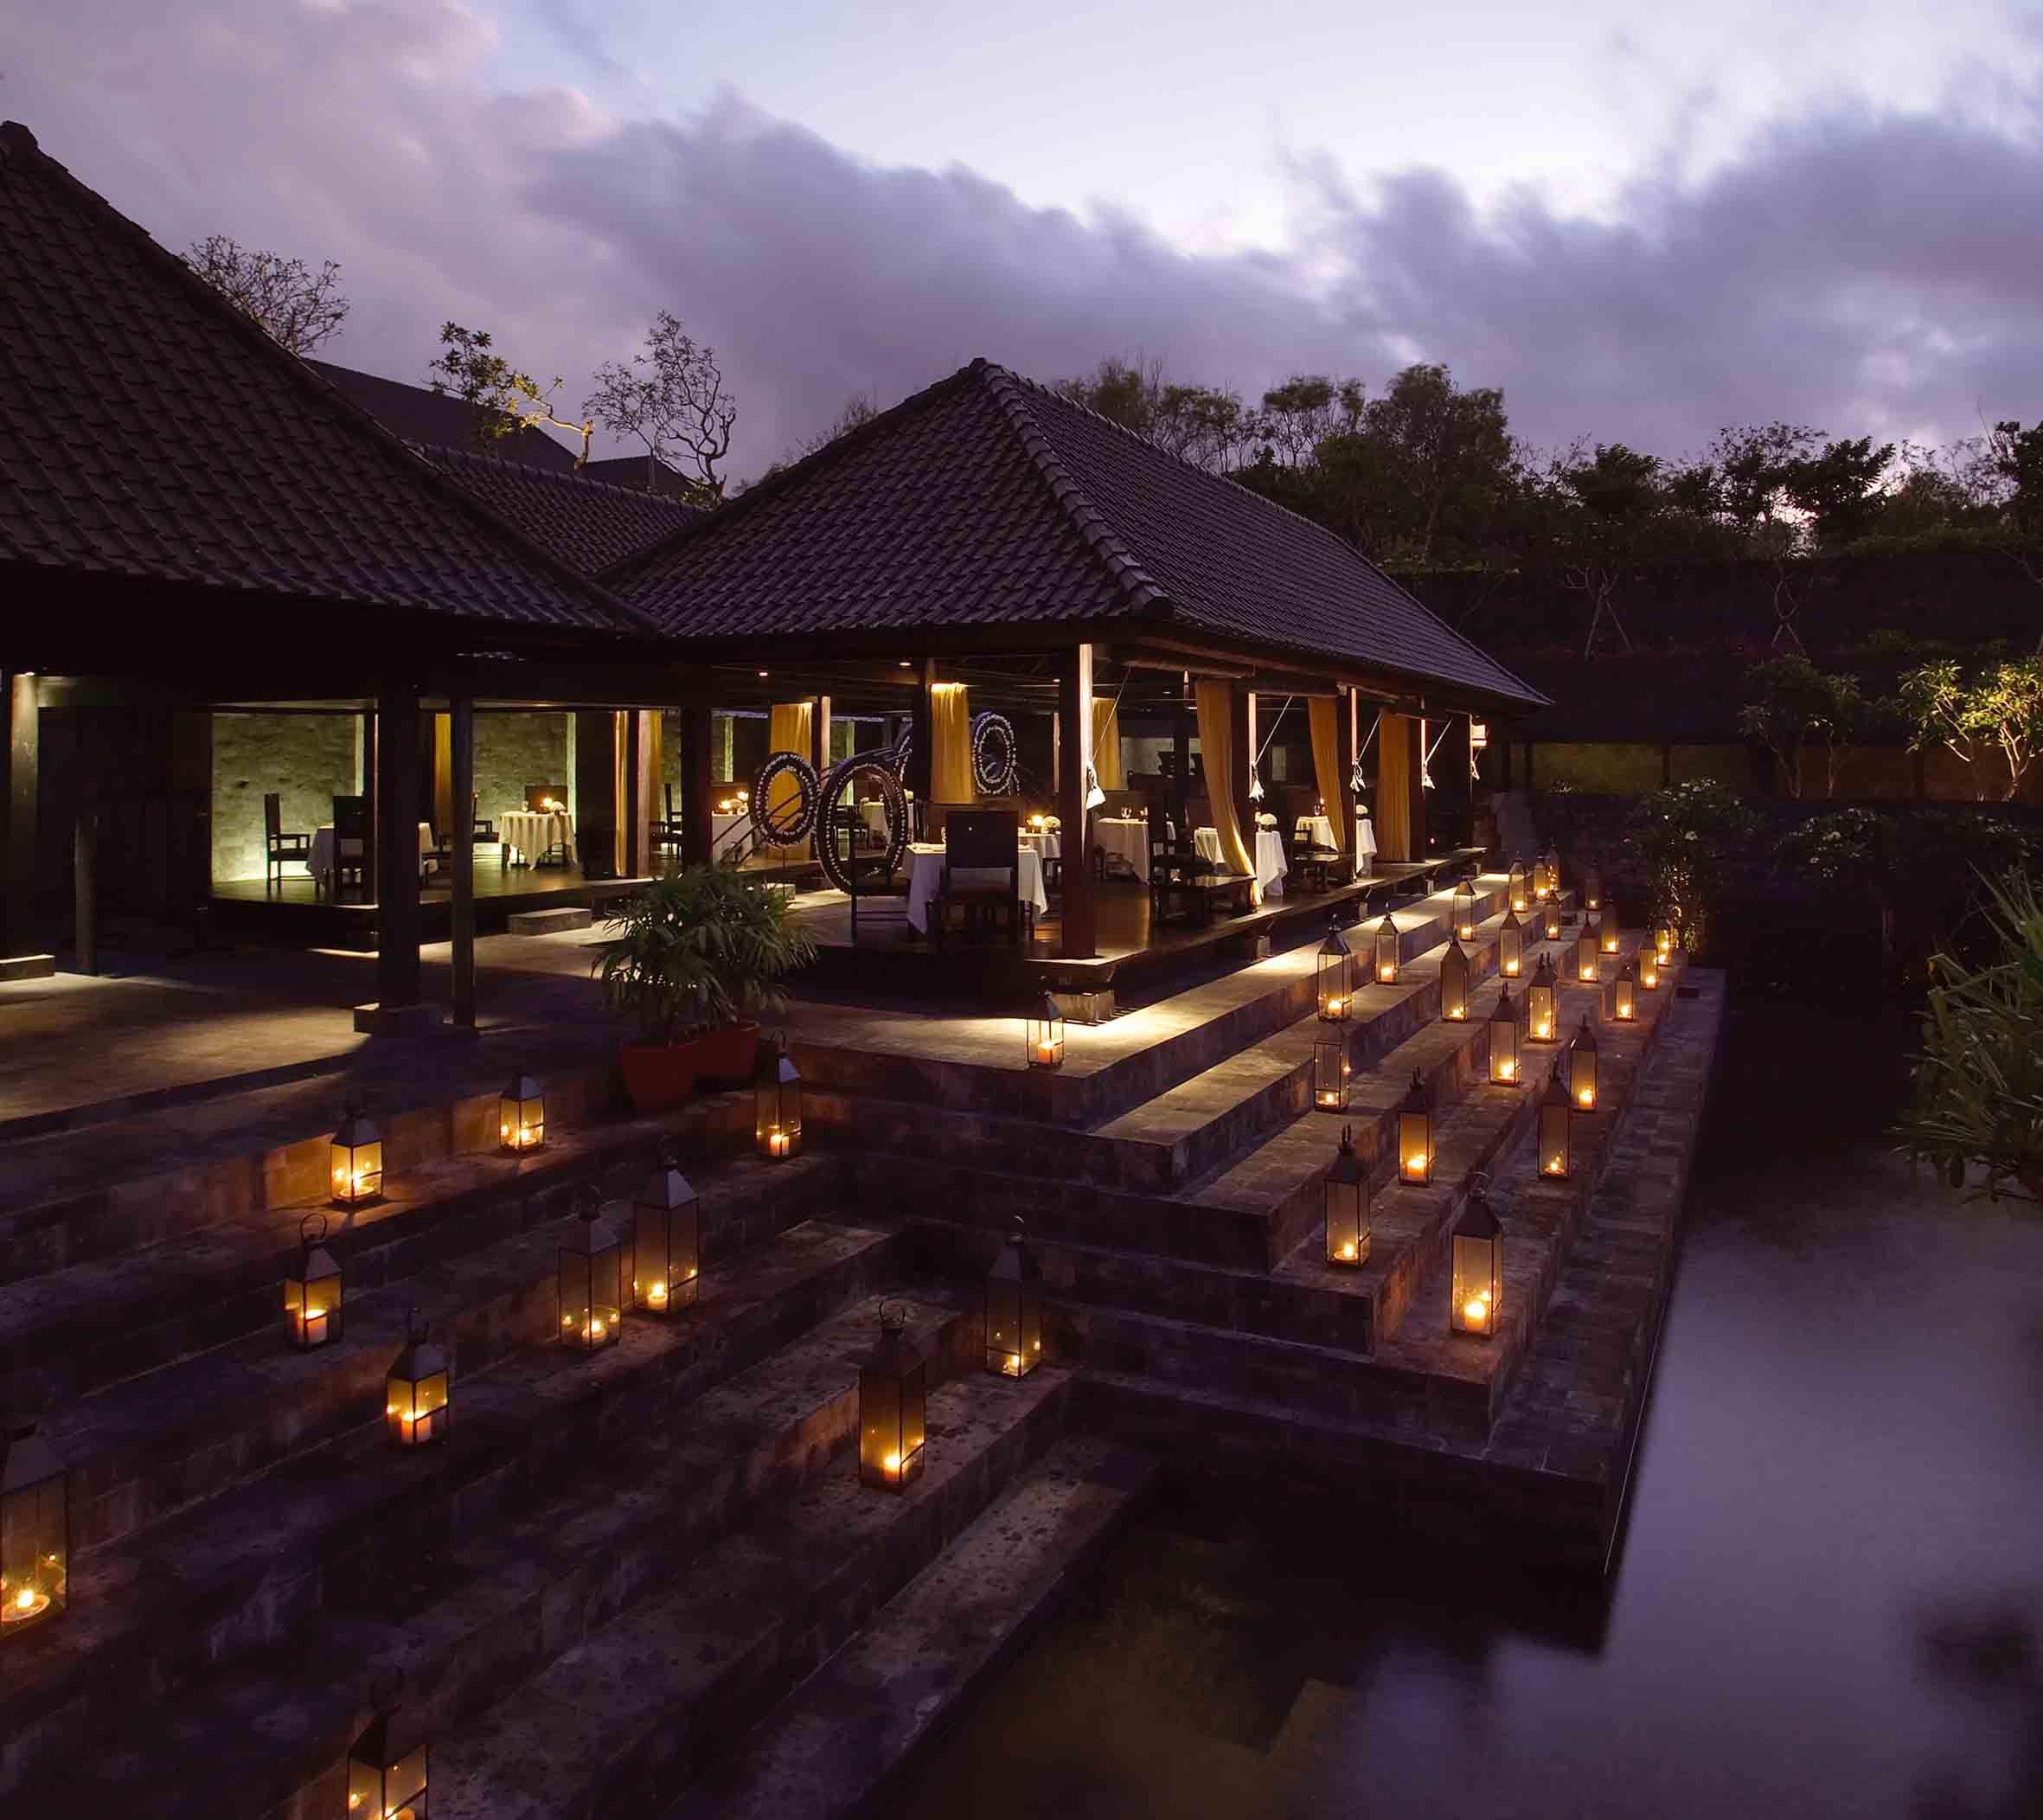 Bulgari Hotel Bali Bali Gunstig Buchen Dsi Reisen Bali Resort Bulgari Resort Bali Bvlgari Hotel